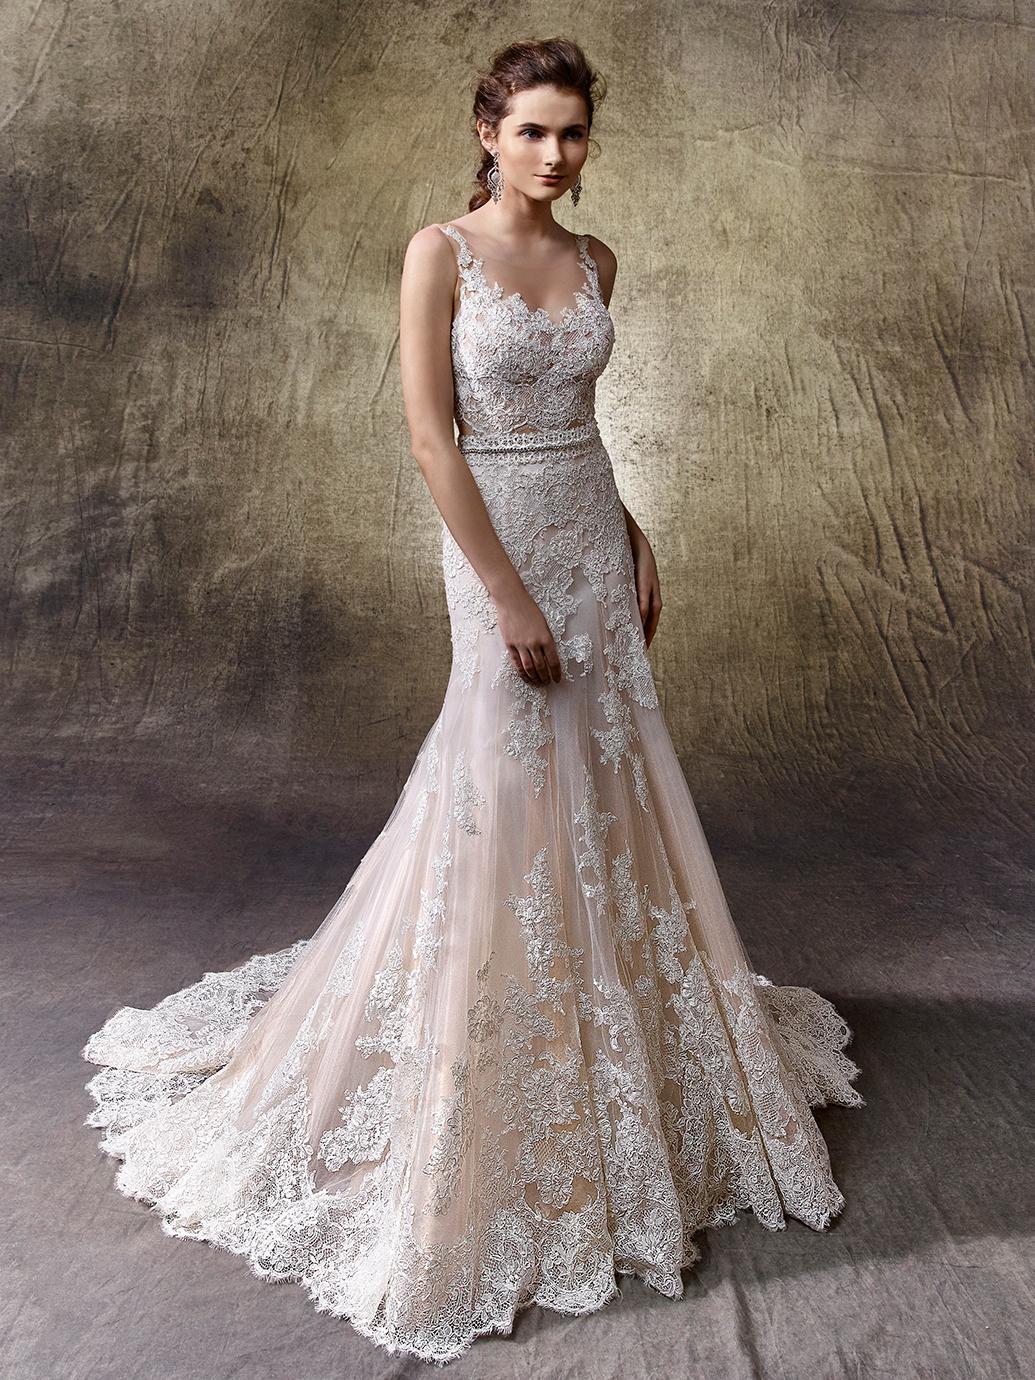 black and white lace wedding dresses photo - 1